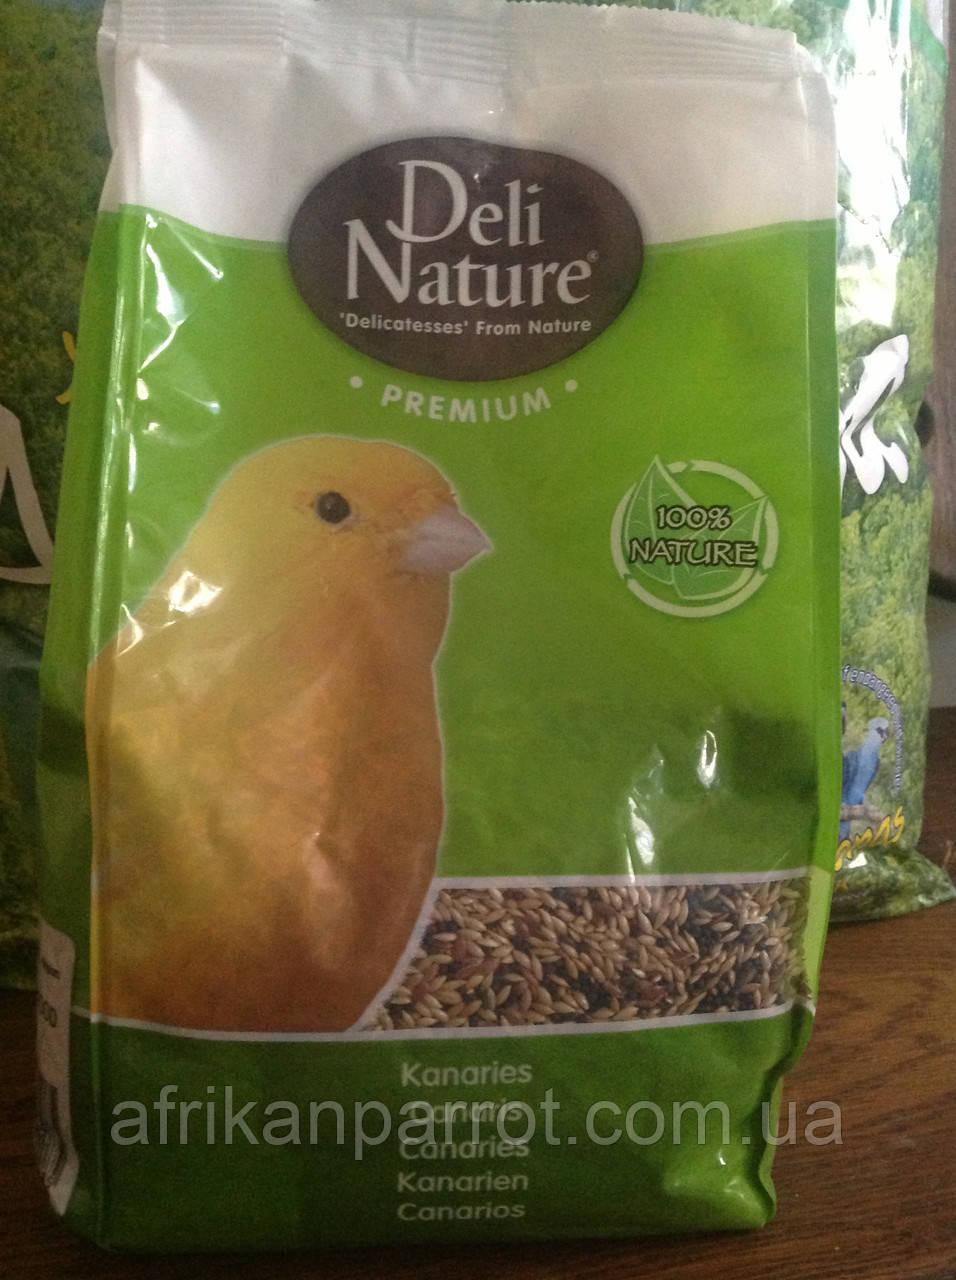 Deli nature корм для канарейки - 1 кг